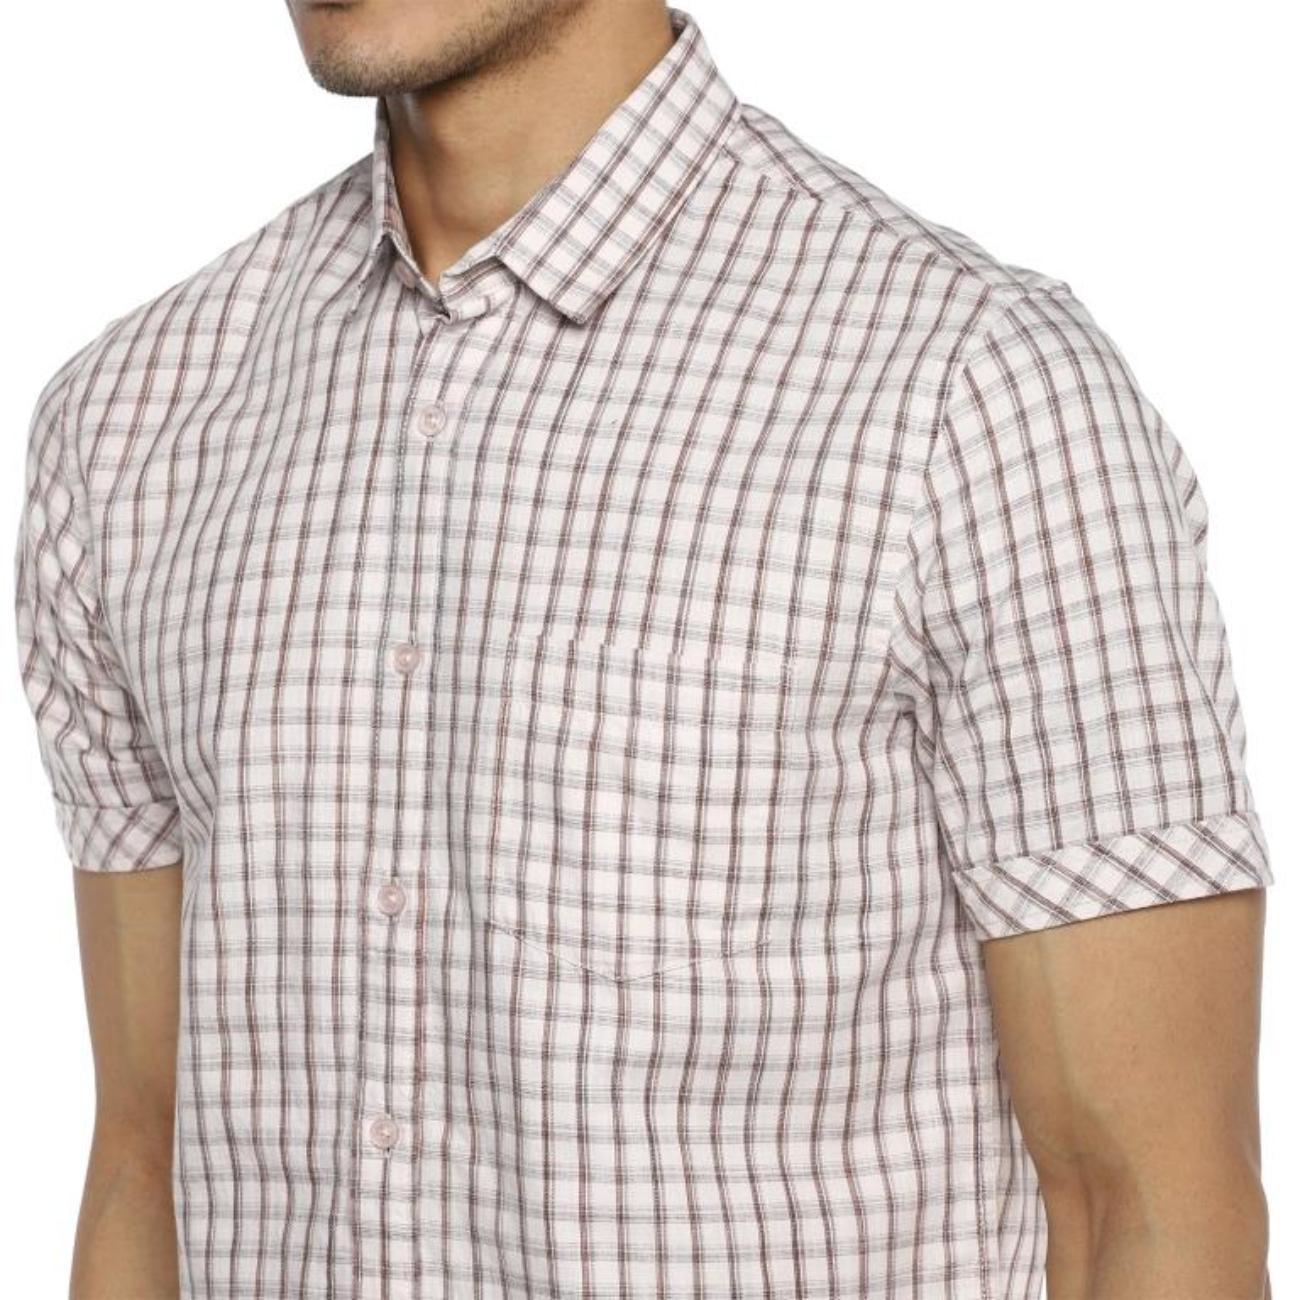 Comfortable Shirts for Men